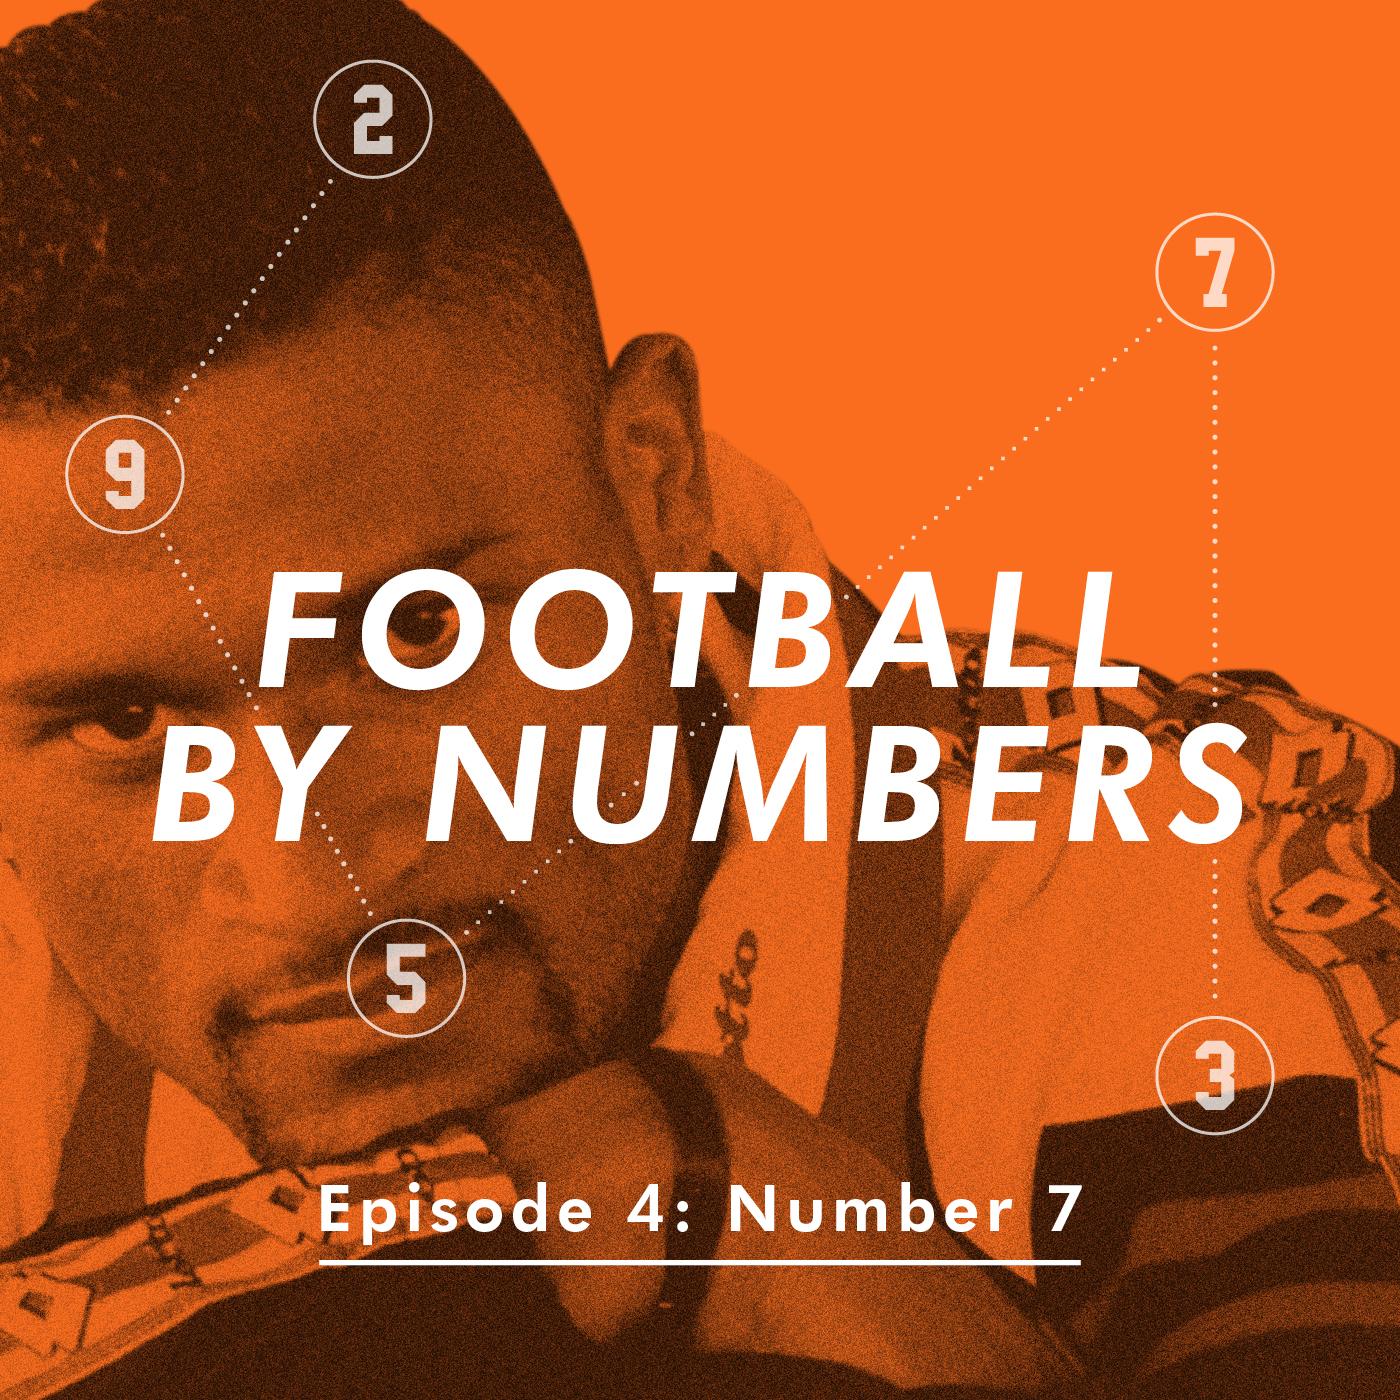 FootballByNumbers-Covers-E4.jpg